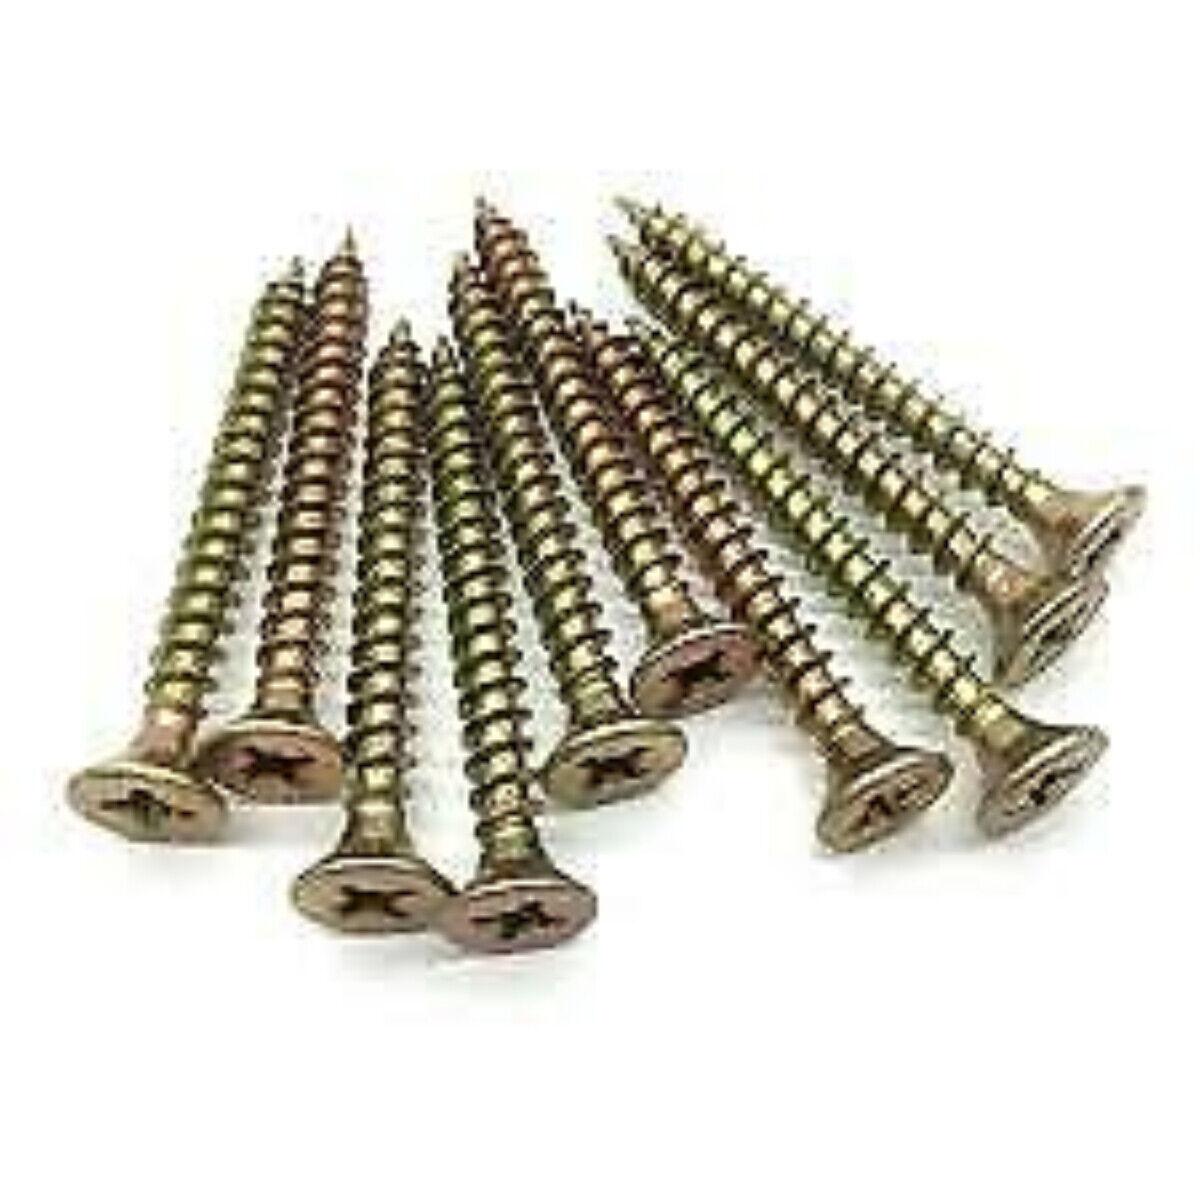 4mm WOOD SCREWS FULL SINGLE THREAD POZIDRIVE MULTI PURPOSE COUNTERSUNK CHIPBOARD